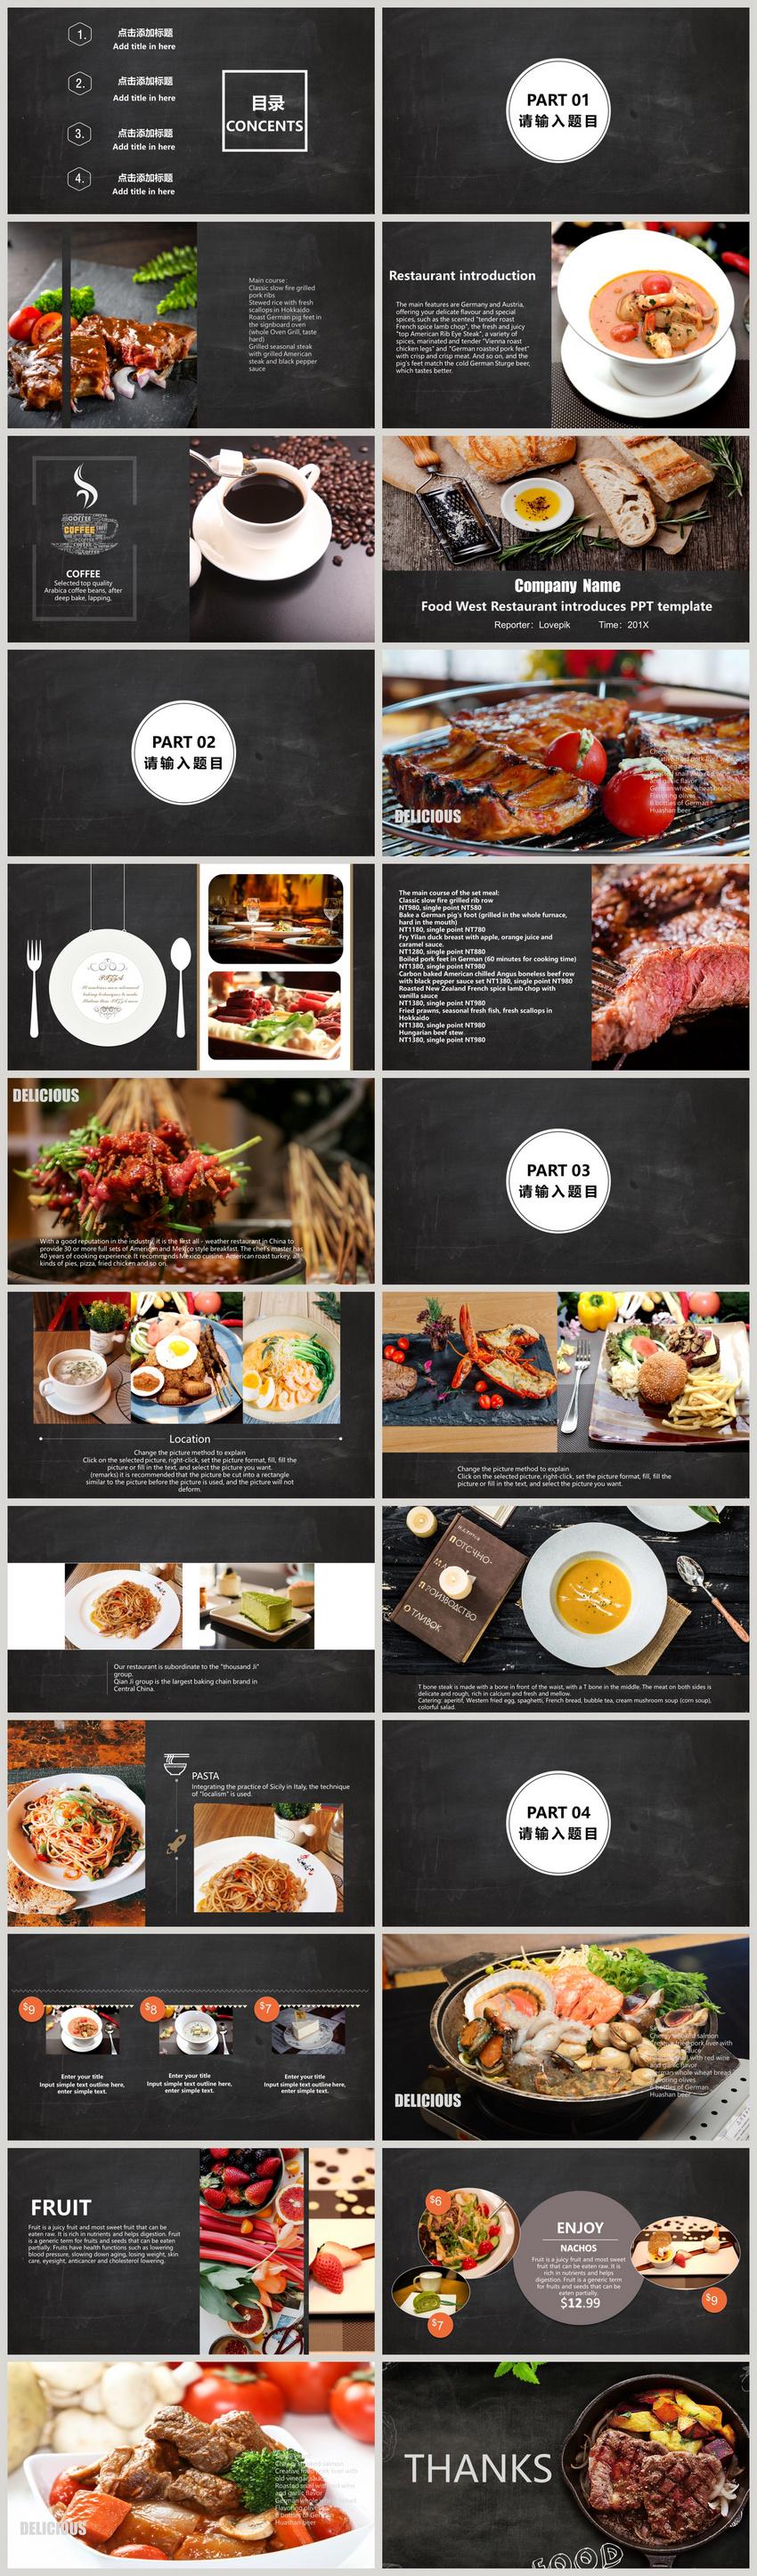 Philip steak food publicity album ppt template powerpoint